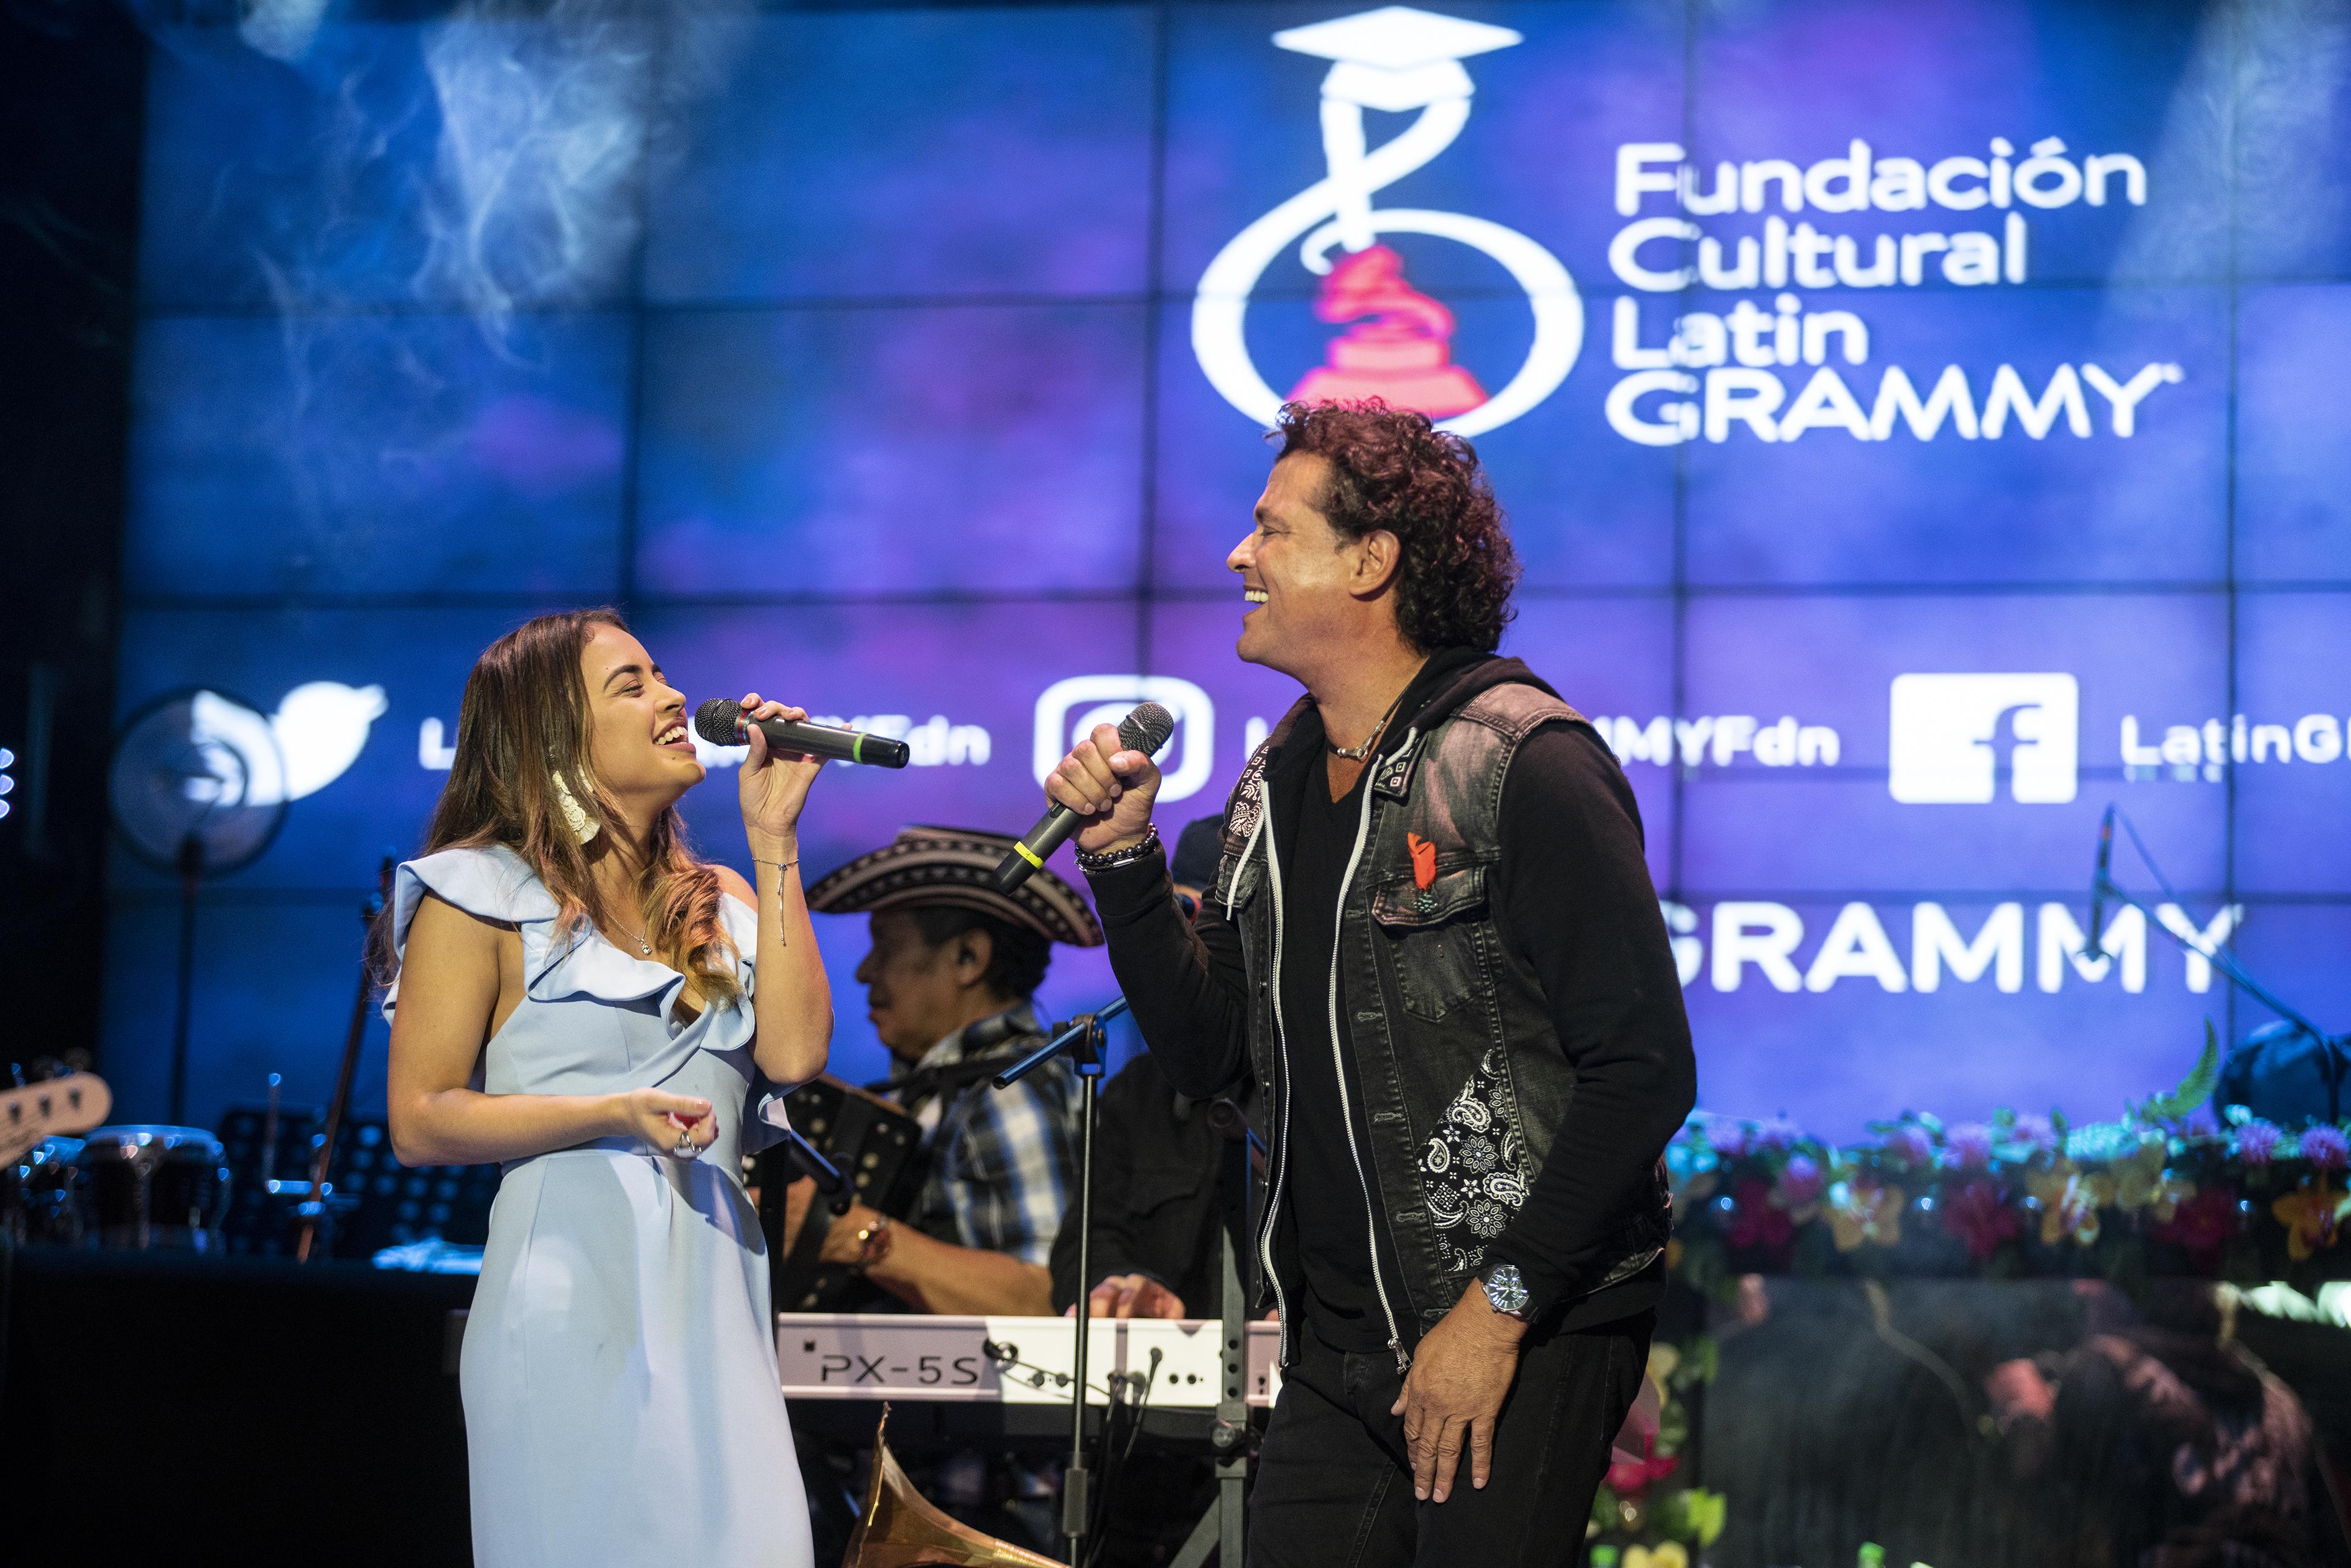 Nicolle Horbath, Scholarship Winner and Carlos Vives June 5 2018